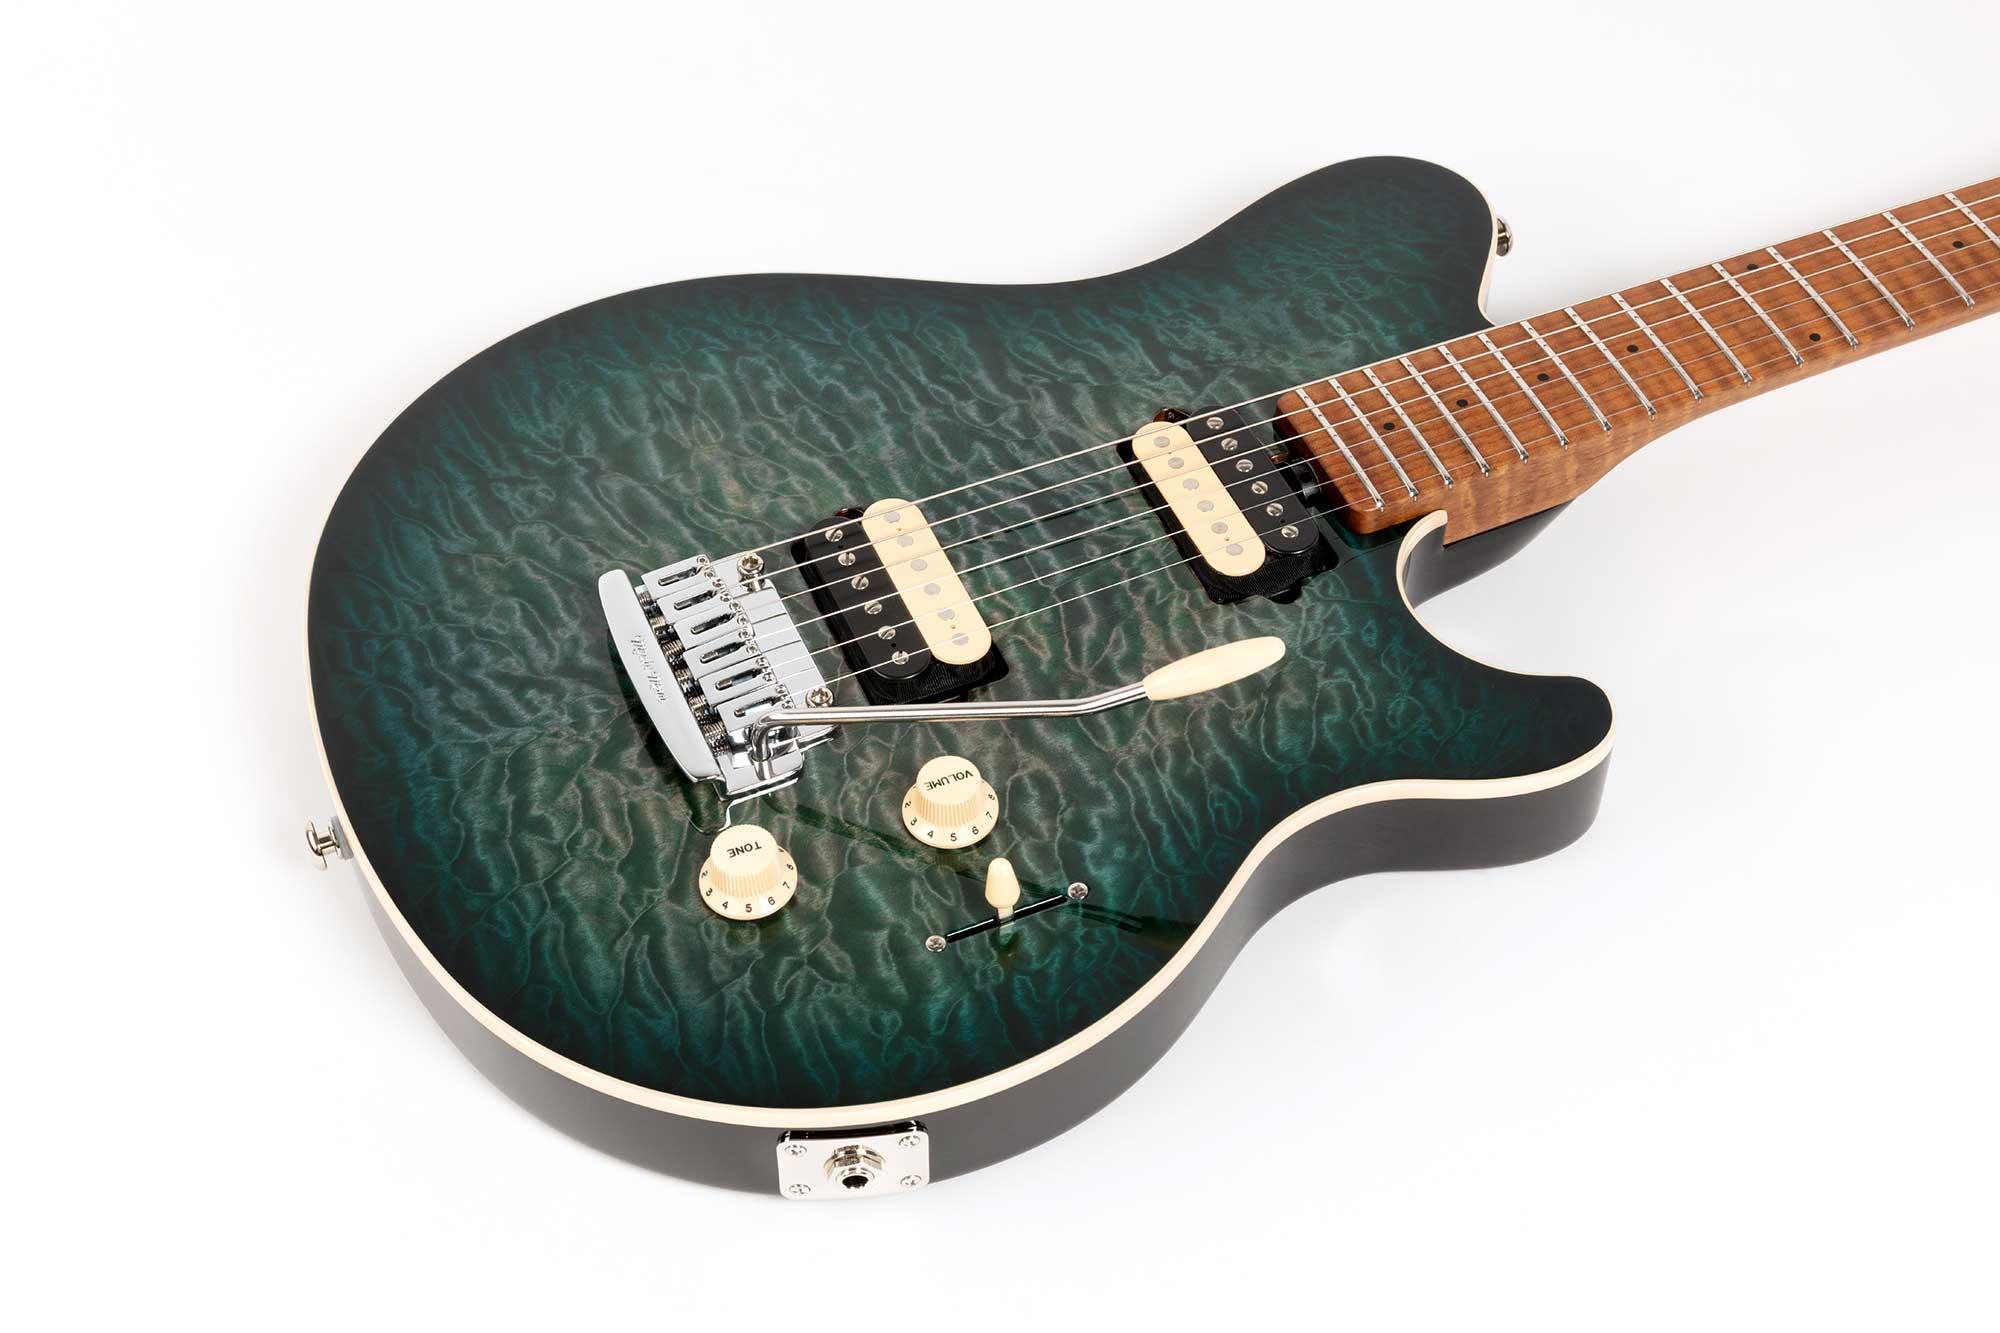 גיטרה חשמלית Music Man Axis Super Sport, Yucatan Blue Quilt